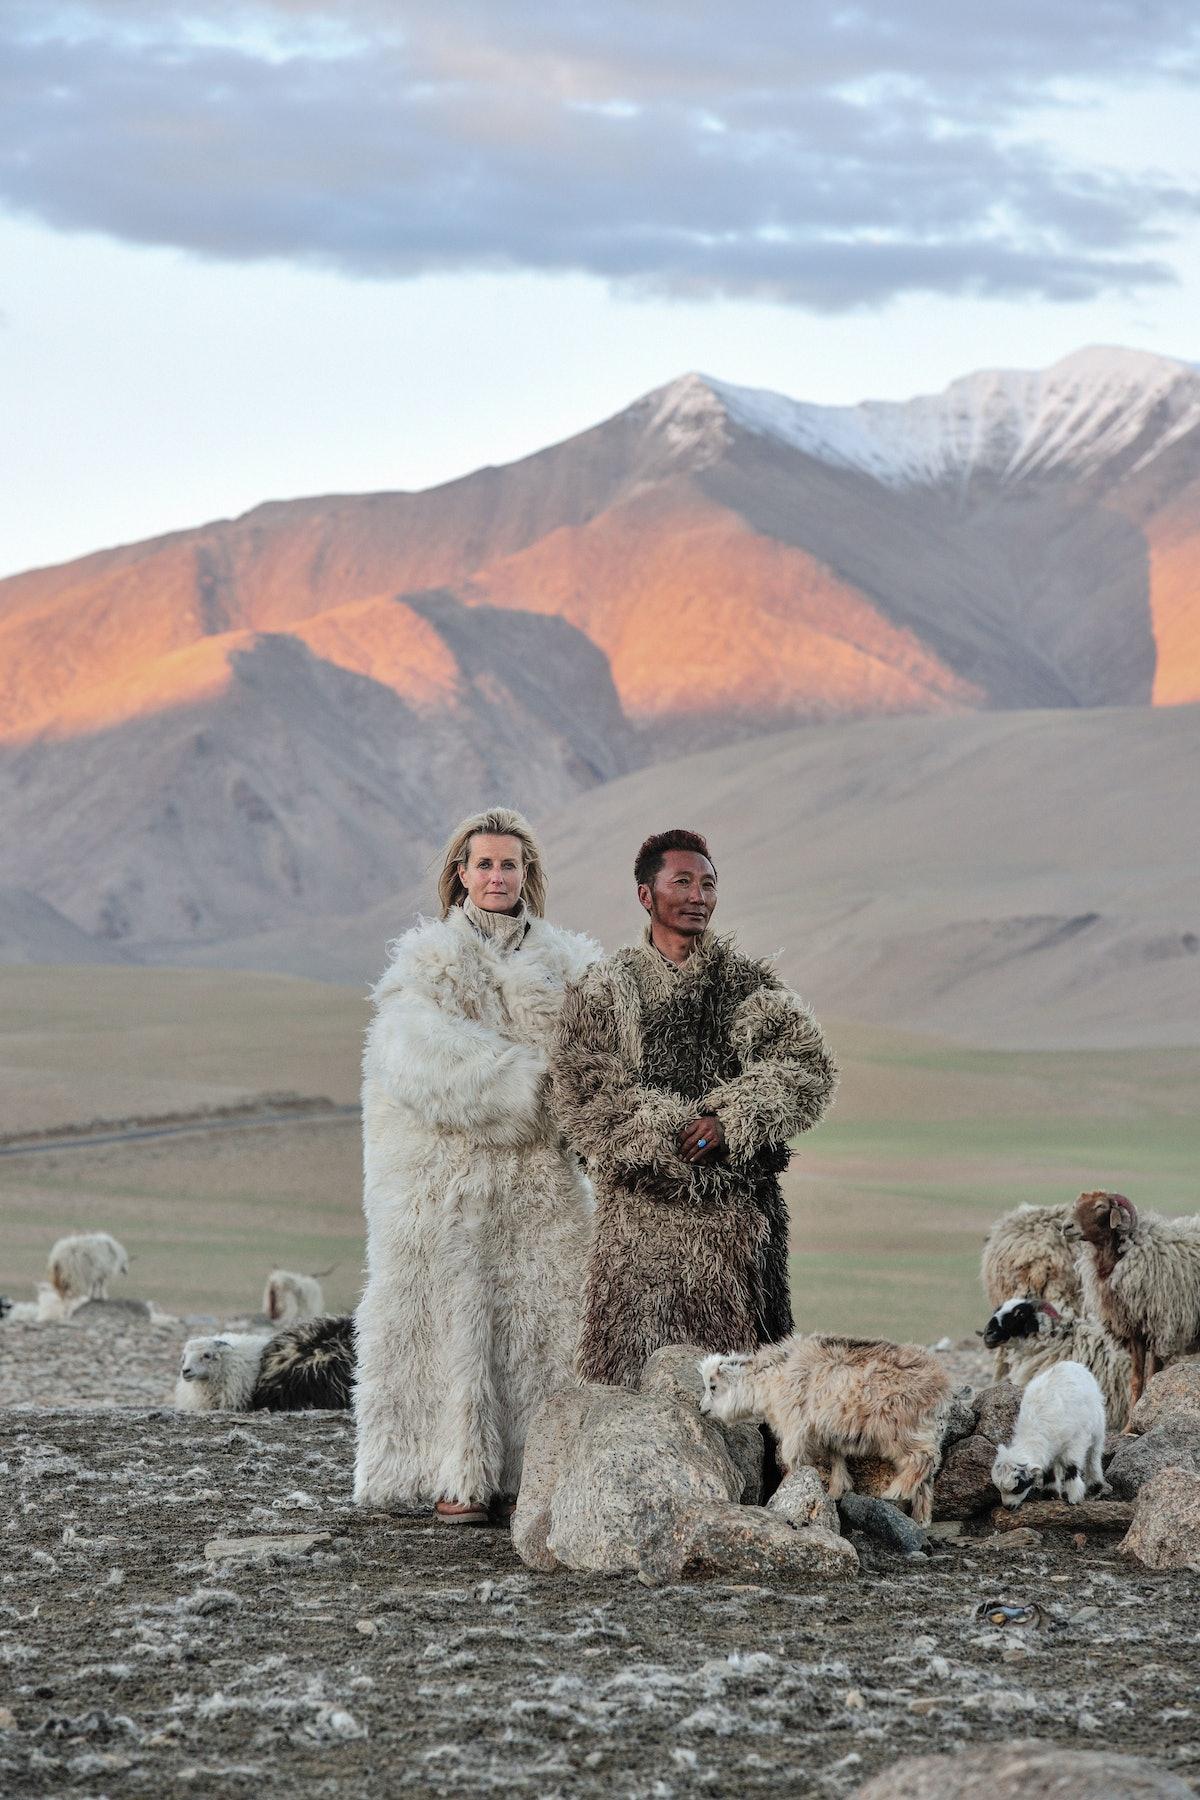 *OPENER IMAGE* Veronique Vermussche designer of Tuinch in the Himalayas %22 Courtesy of Tuinch%22.jpg